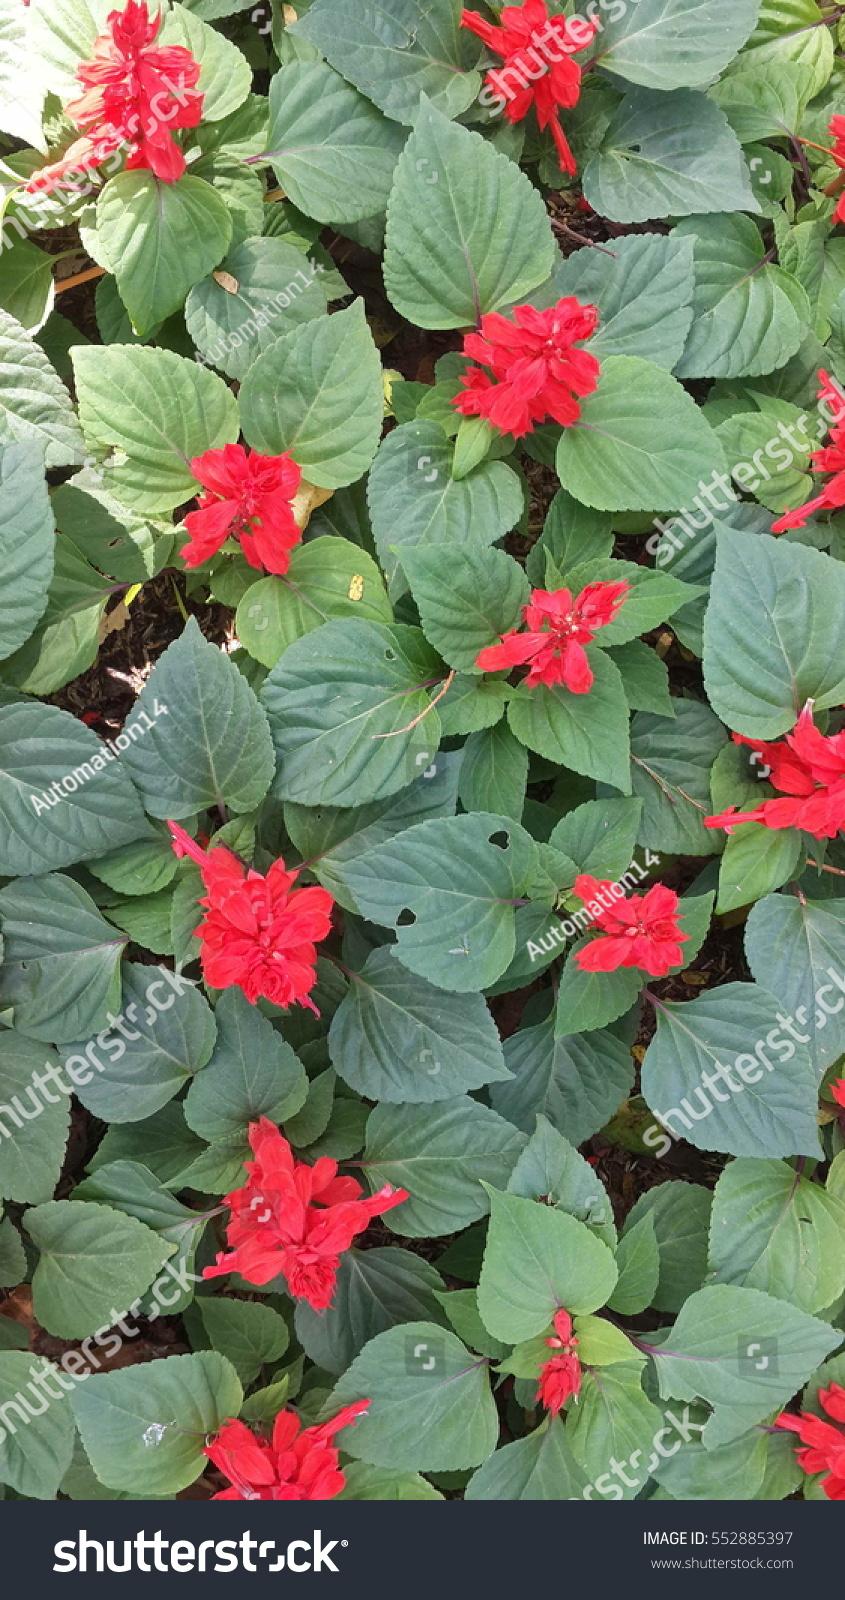 Amazing views of nature beautiful flowers in the garden under the id 552885397 izmirmasajfo